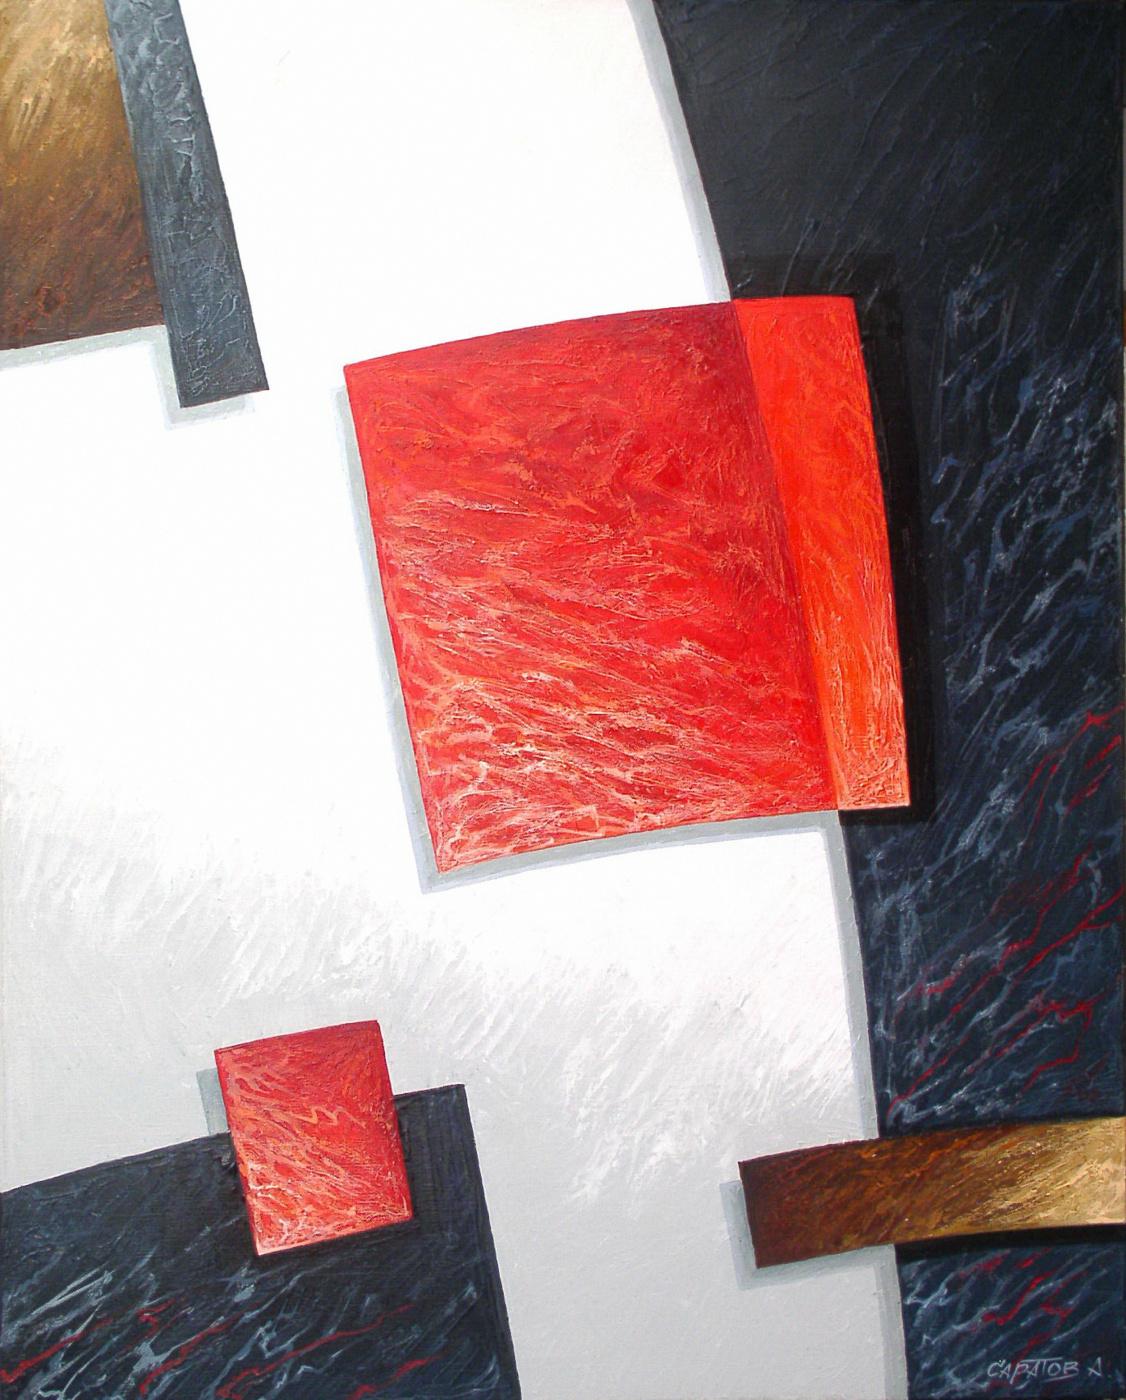 Andrei Ivanovich Saratov. Composition with red square